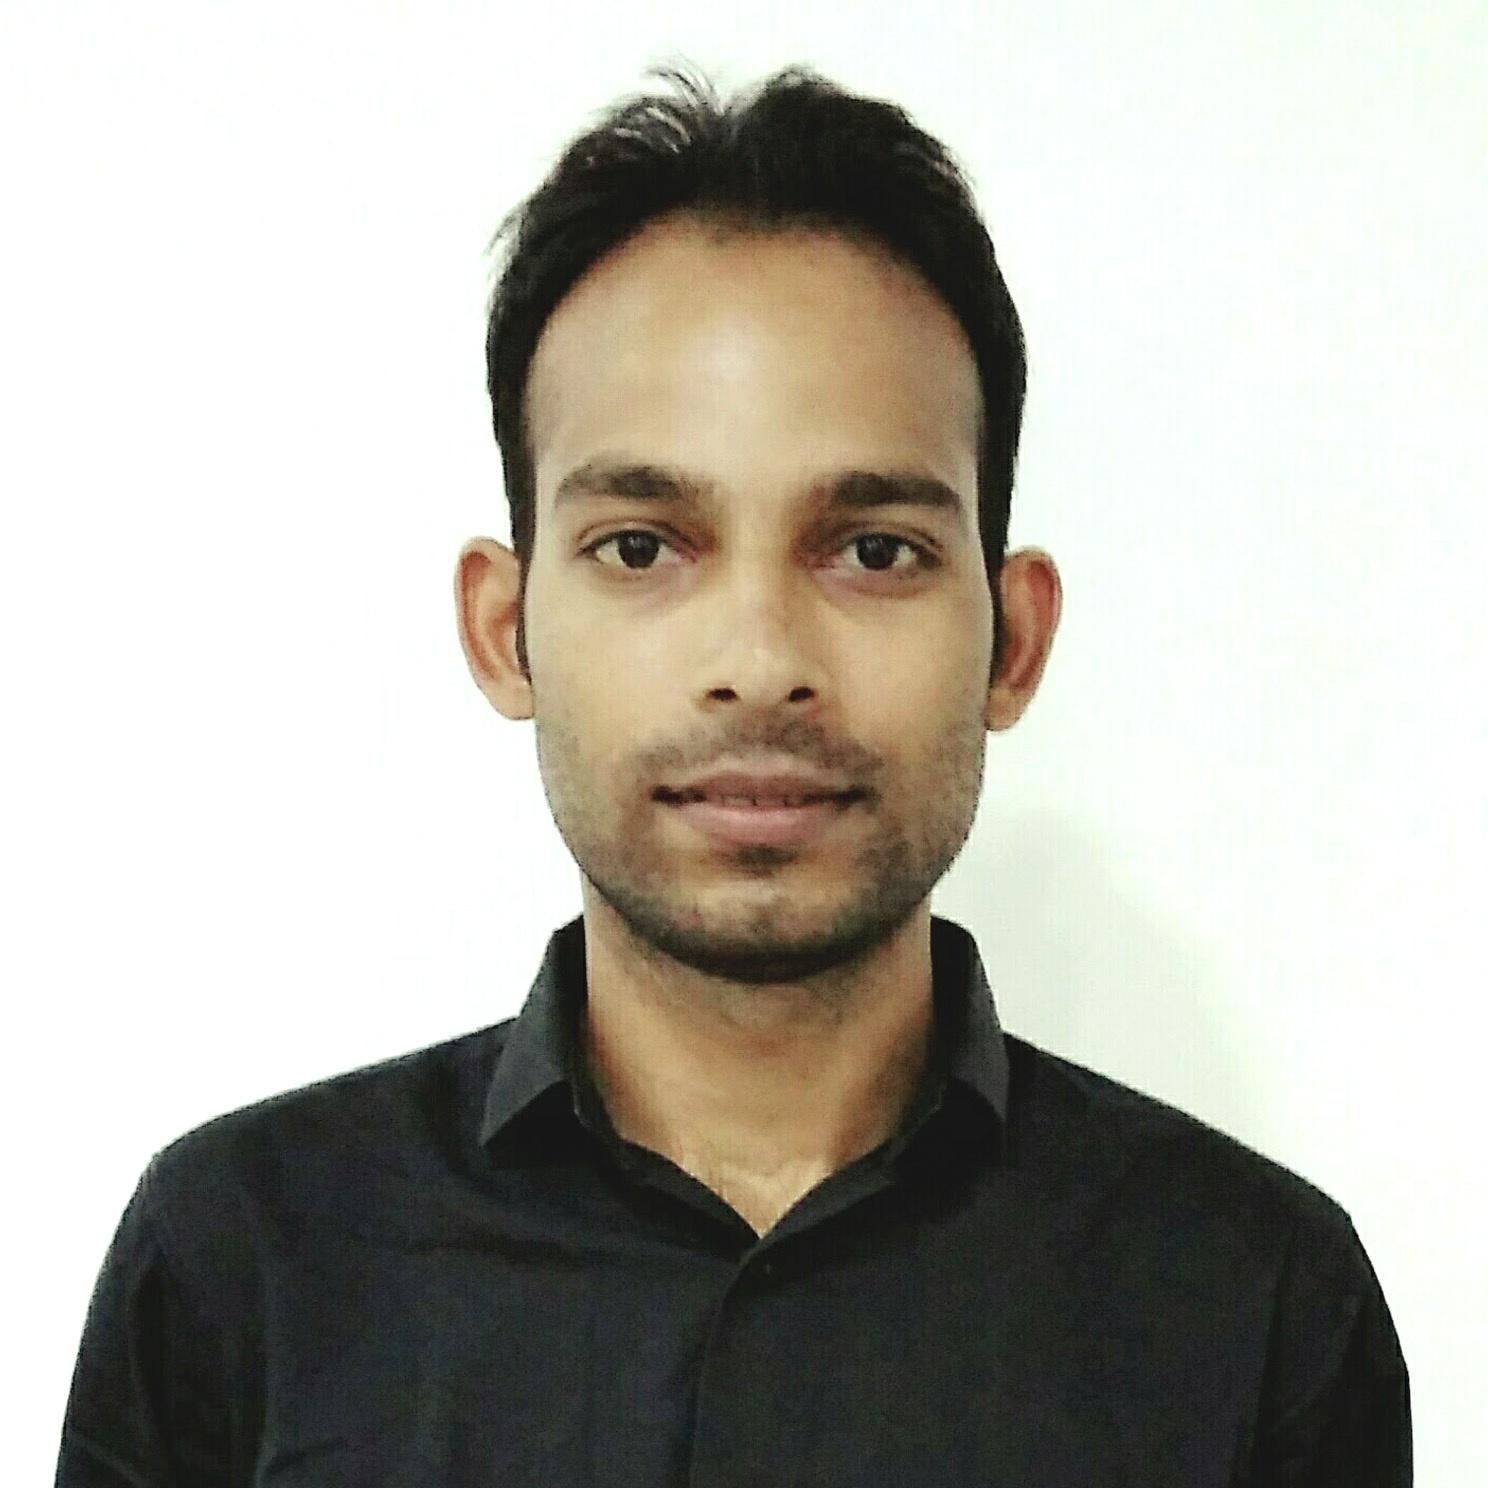 https://i0.wp.com/coretechies.com/wp-content/uploads/2020/04/Krishna-Dev-Sharma.jpg?fit=1488%2C1488&ssl=1